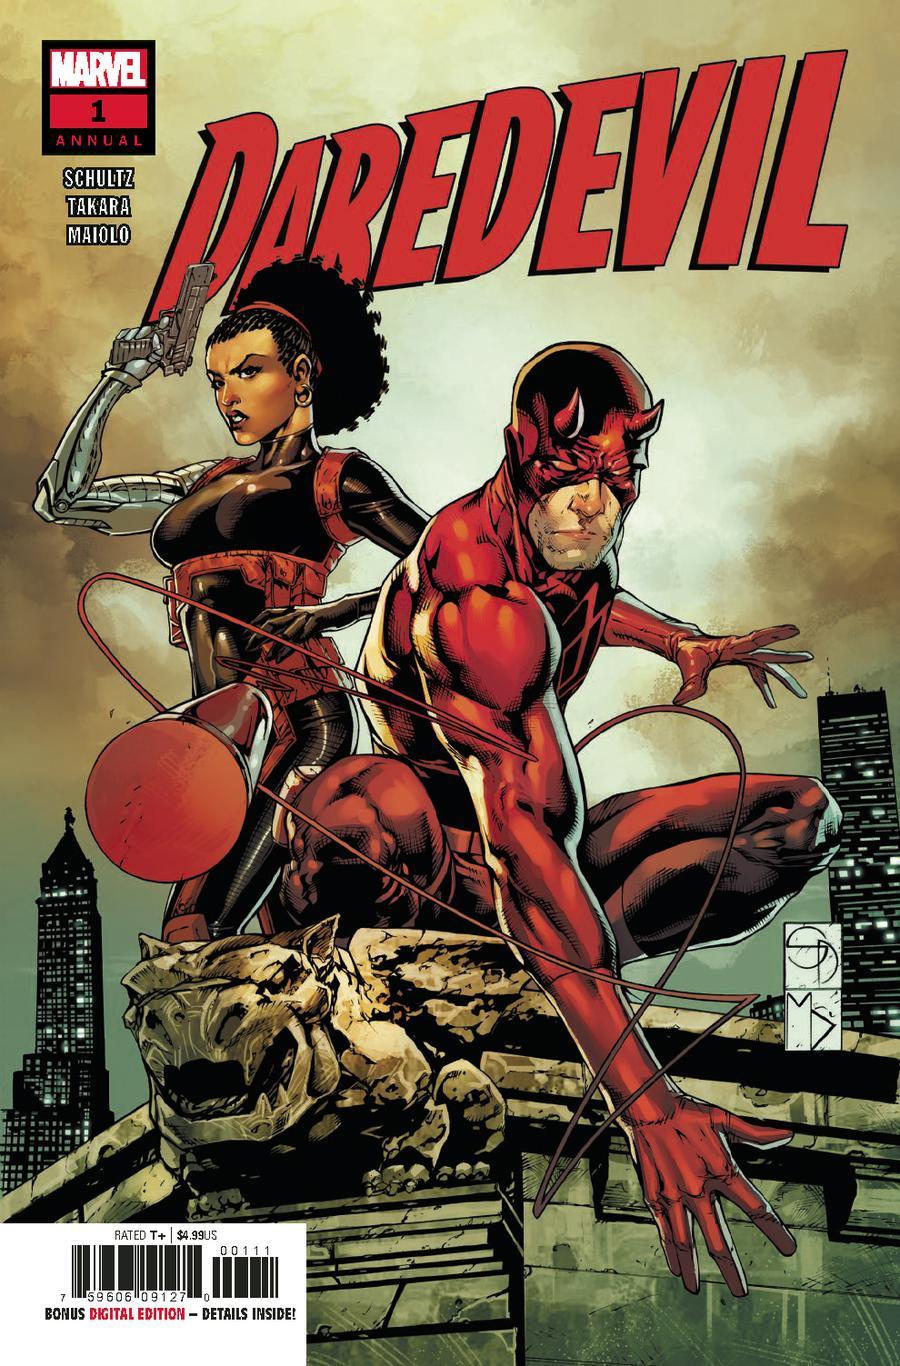 Daredevil Vol 5 Annual #1 2018 Cover A Regular Shane Davis Cover